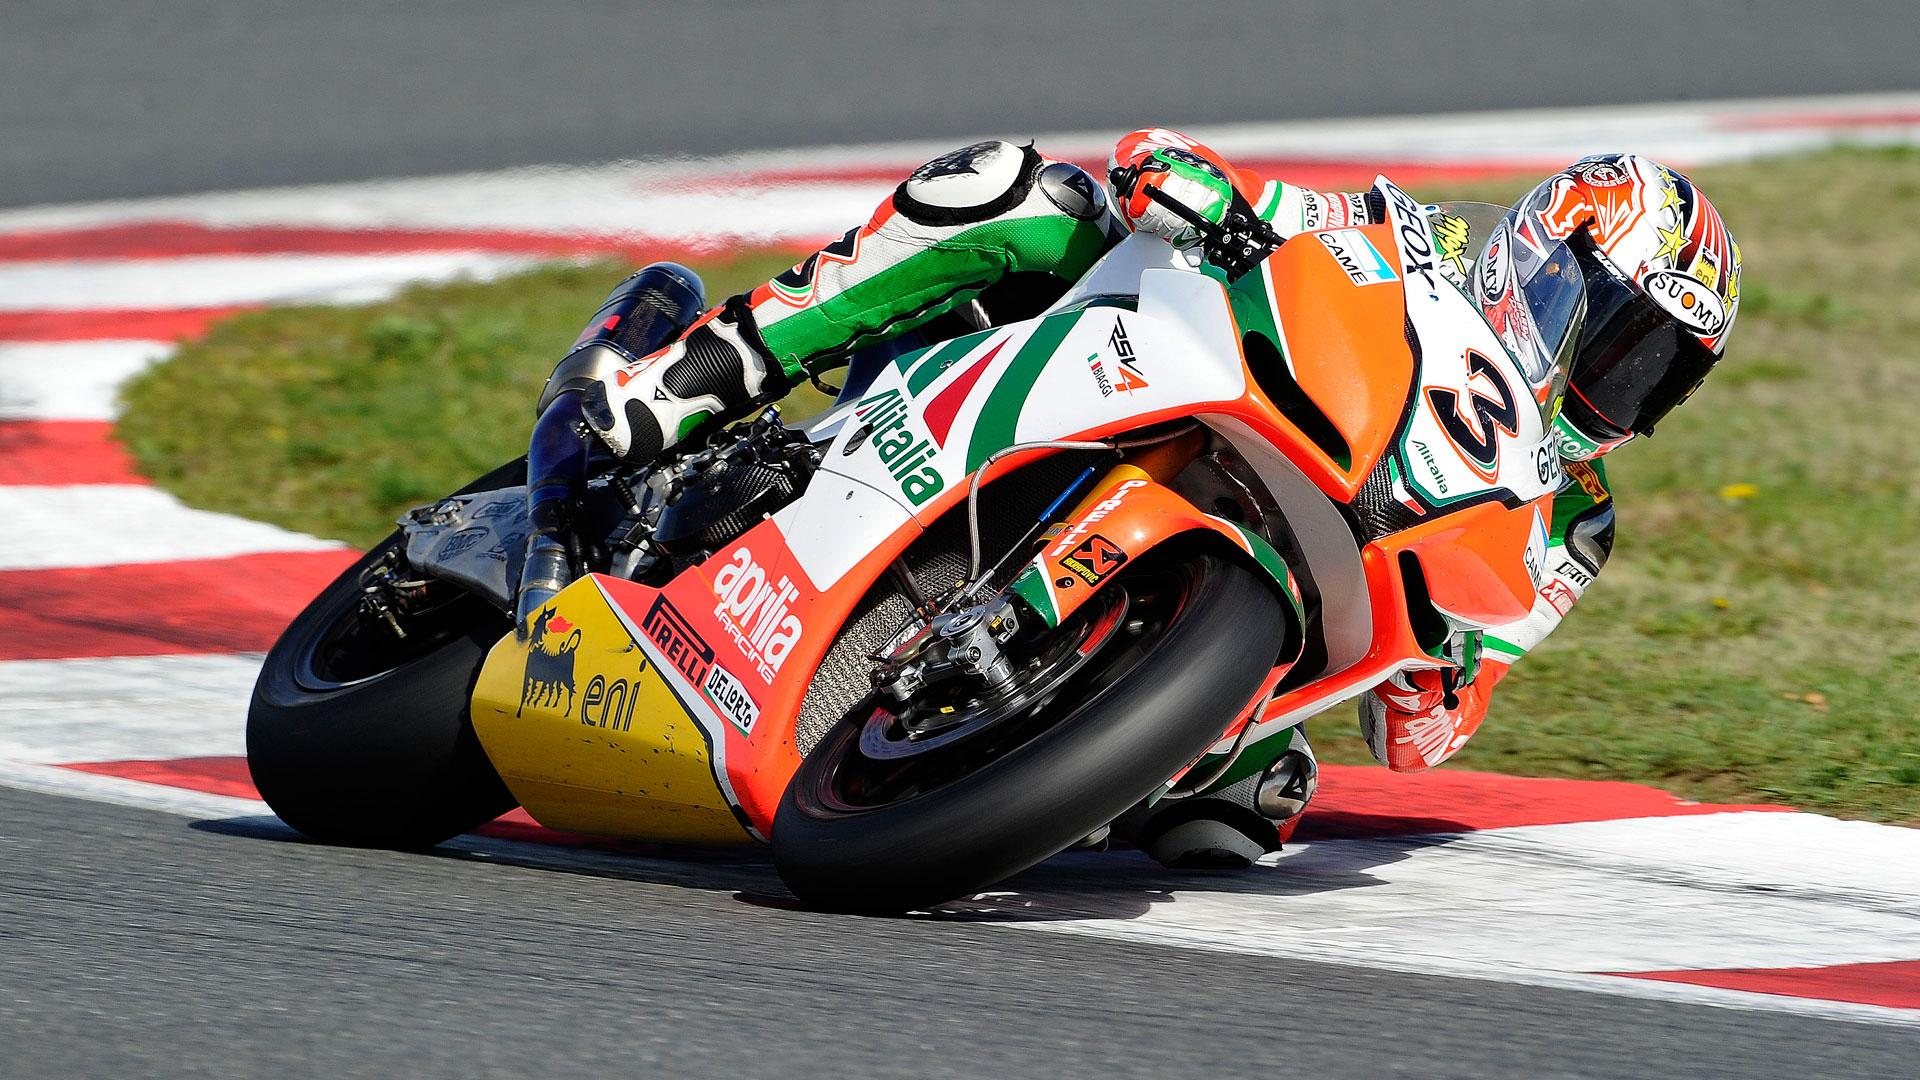 Aprilia en las carreras 4ª parte (Superbike)